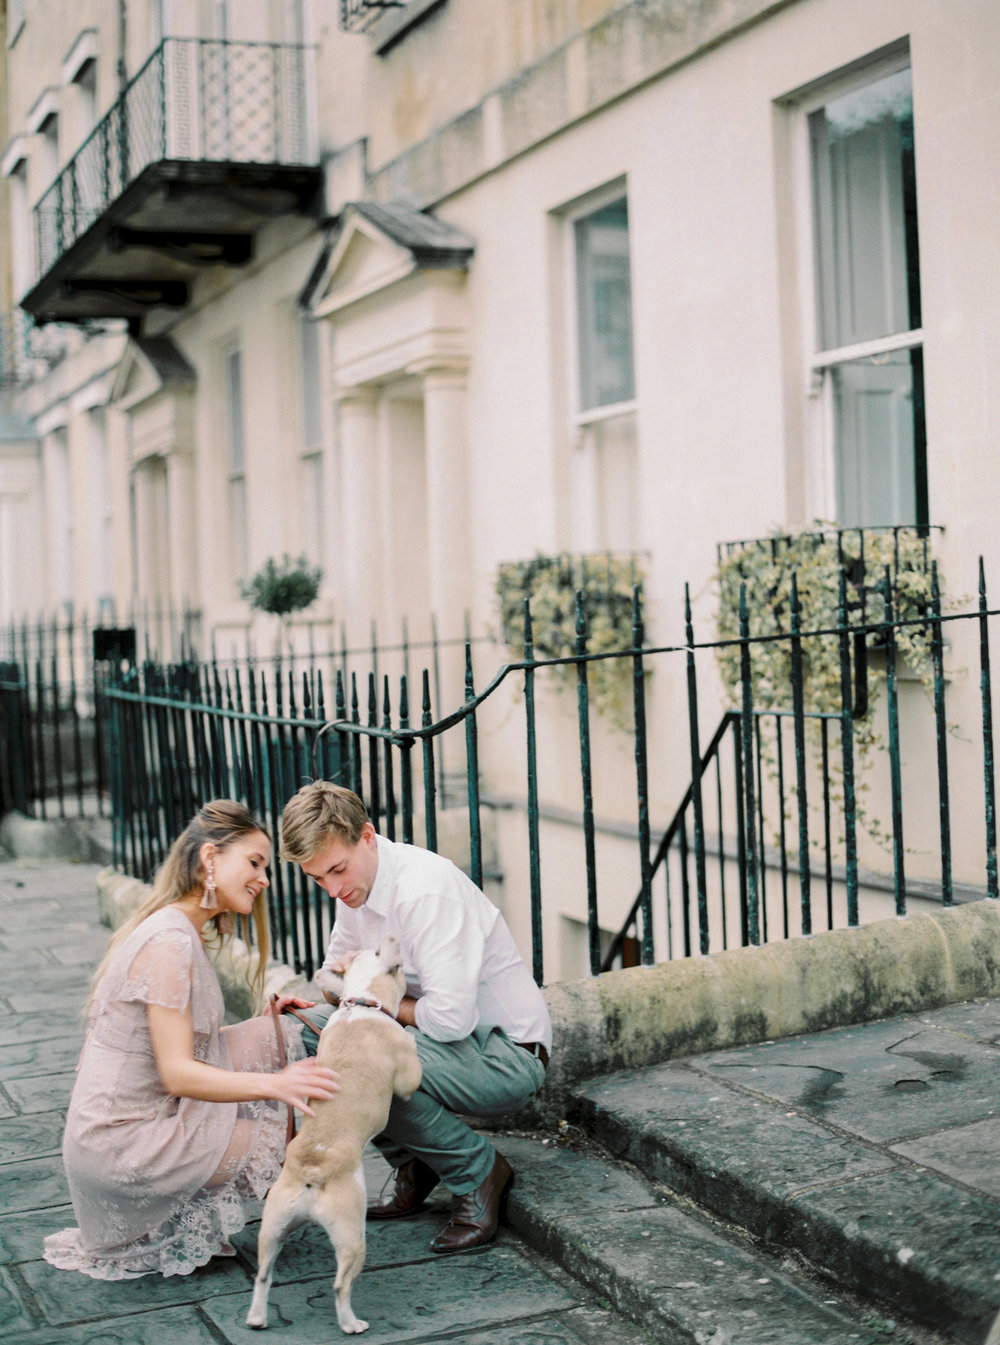 Luxury Wedding Planner UK | Our Chic & Romantic Engagement Shoot in Bath | Katie Julia Photography - 27.JPG